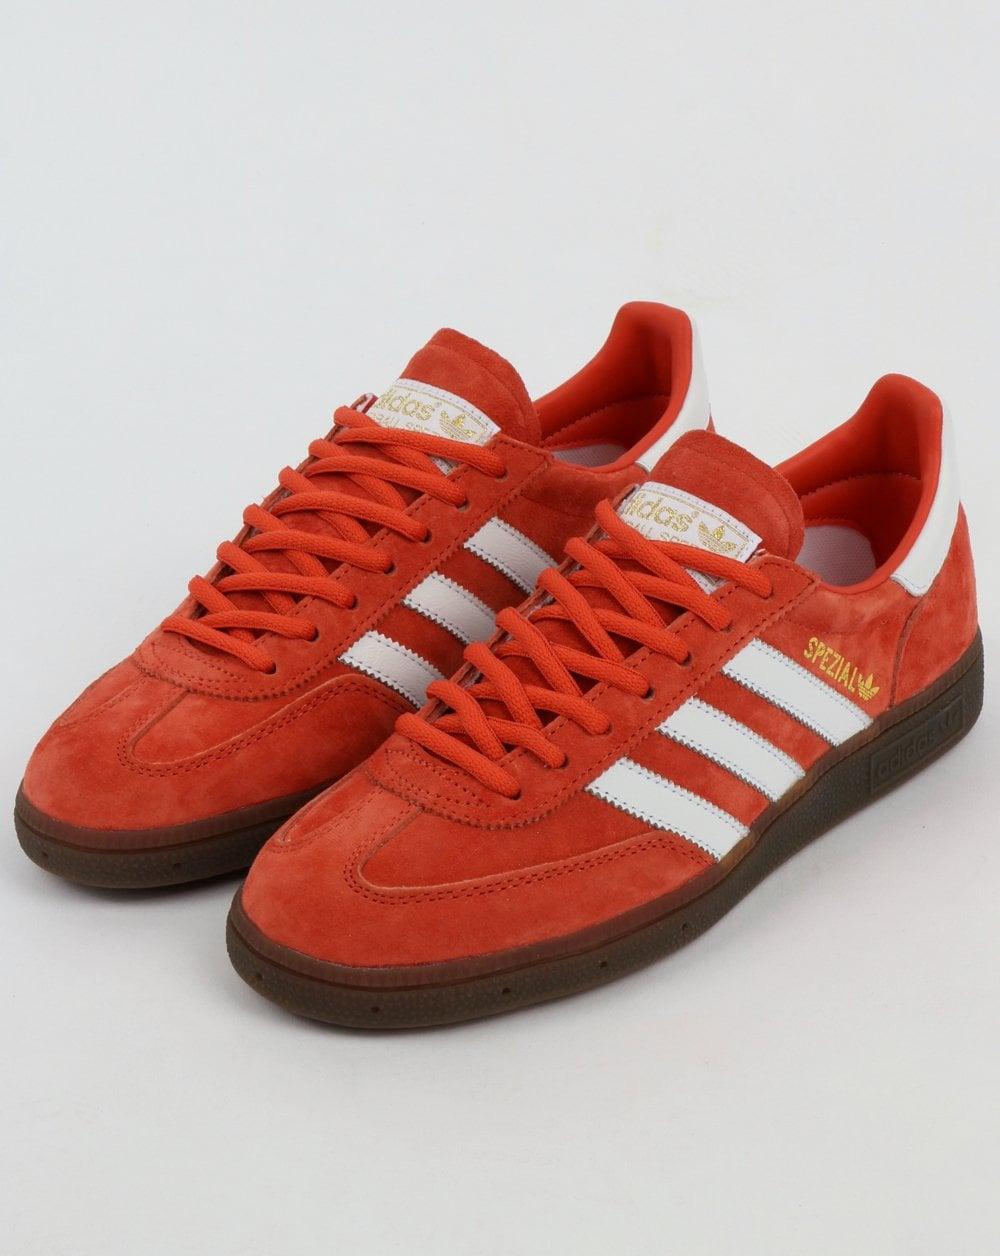 super popular c58a9 c1ebb Adidas Spezial Trainers Red AmberWhite